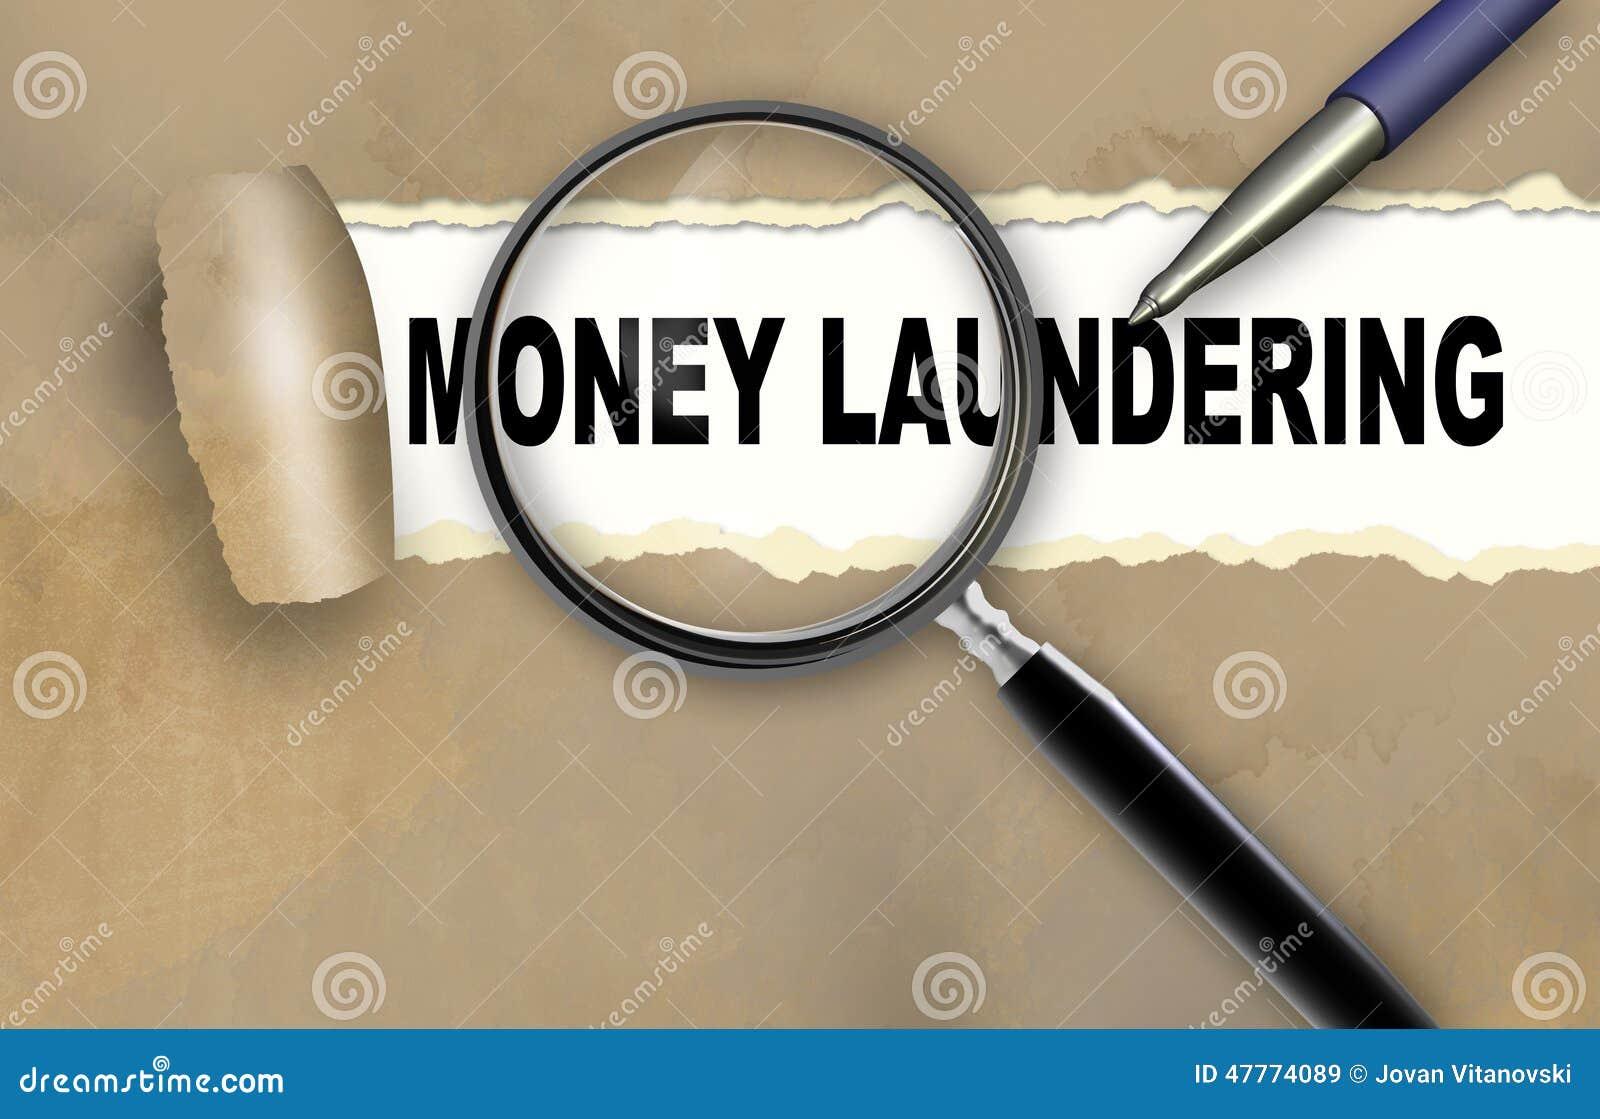 Money management software personal